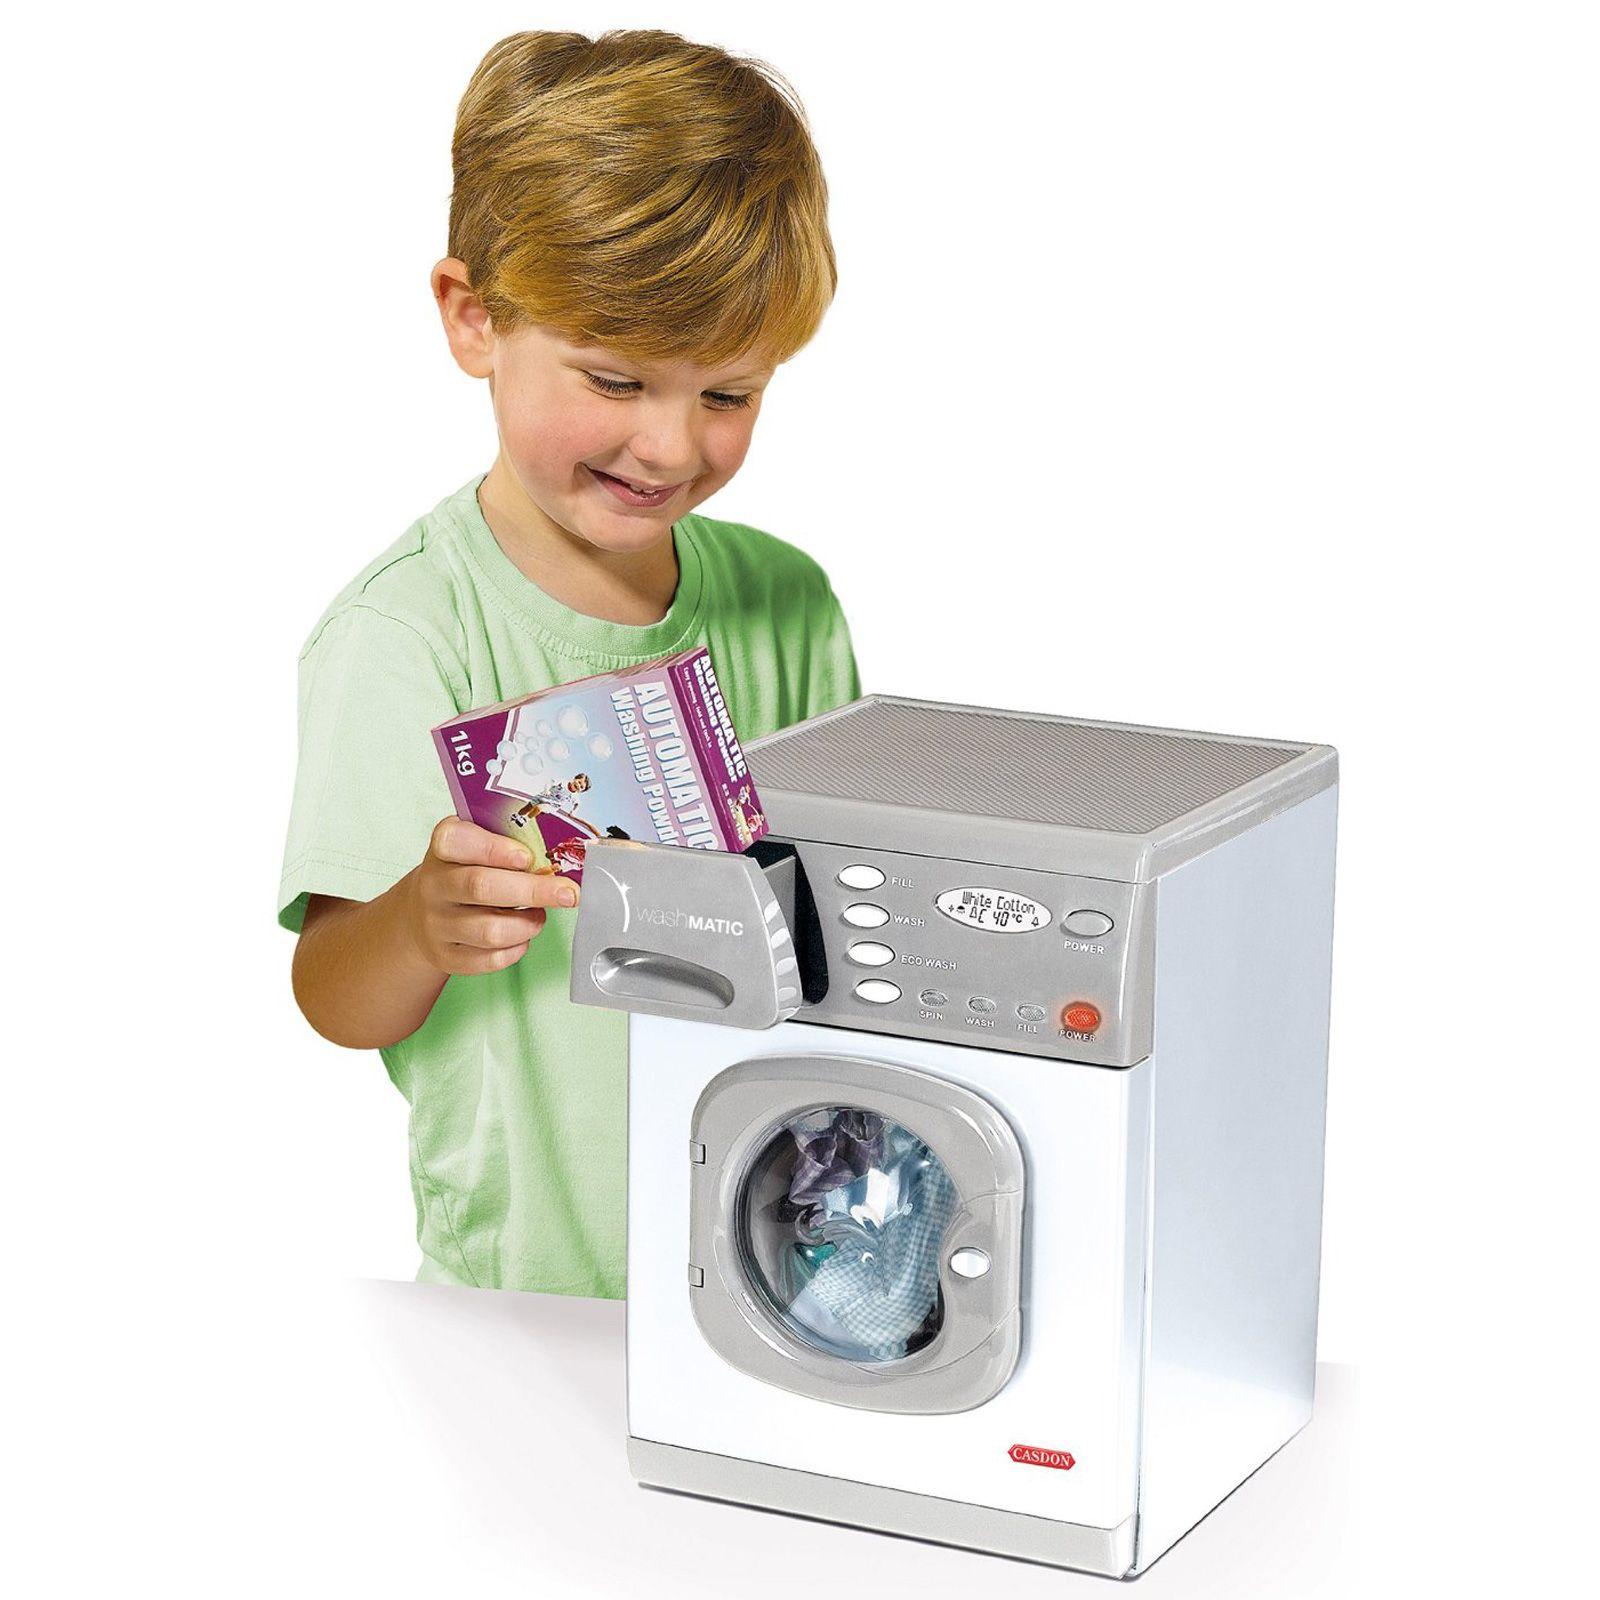 waschmaschine neu verpackt elektronisch kinder spielzeug. Black Bedroom Furniture Sets. Home Design Ideas